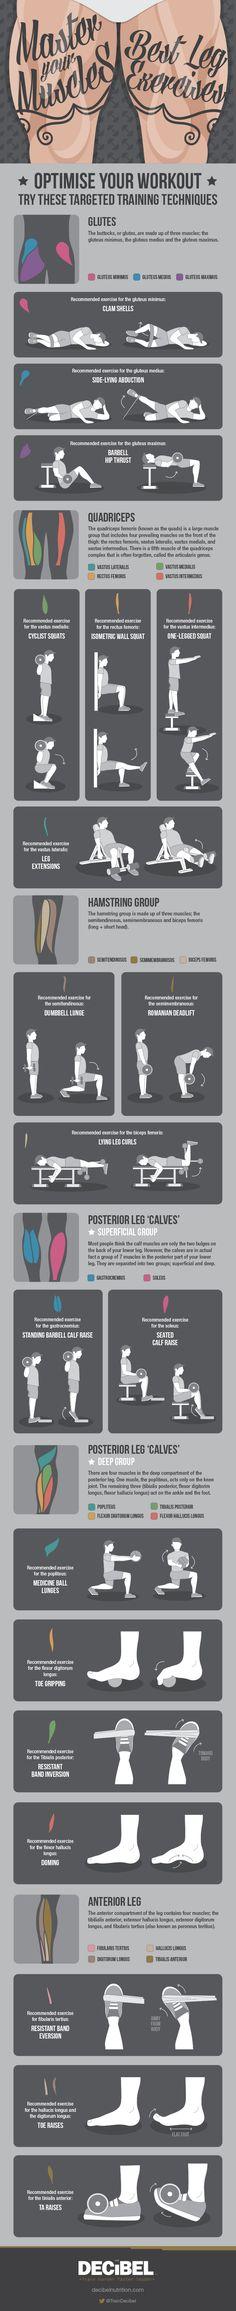 Master Your Muscles: Best Leg Exercises - Imgur